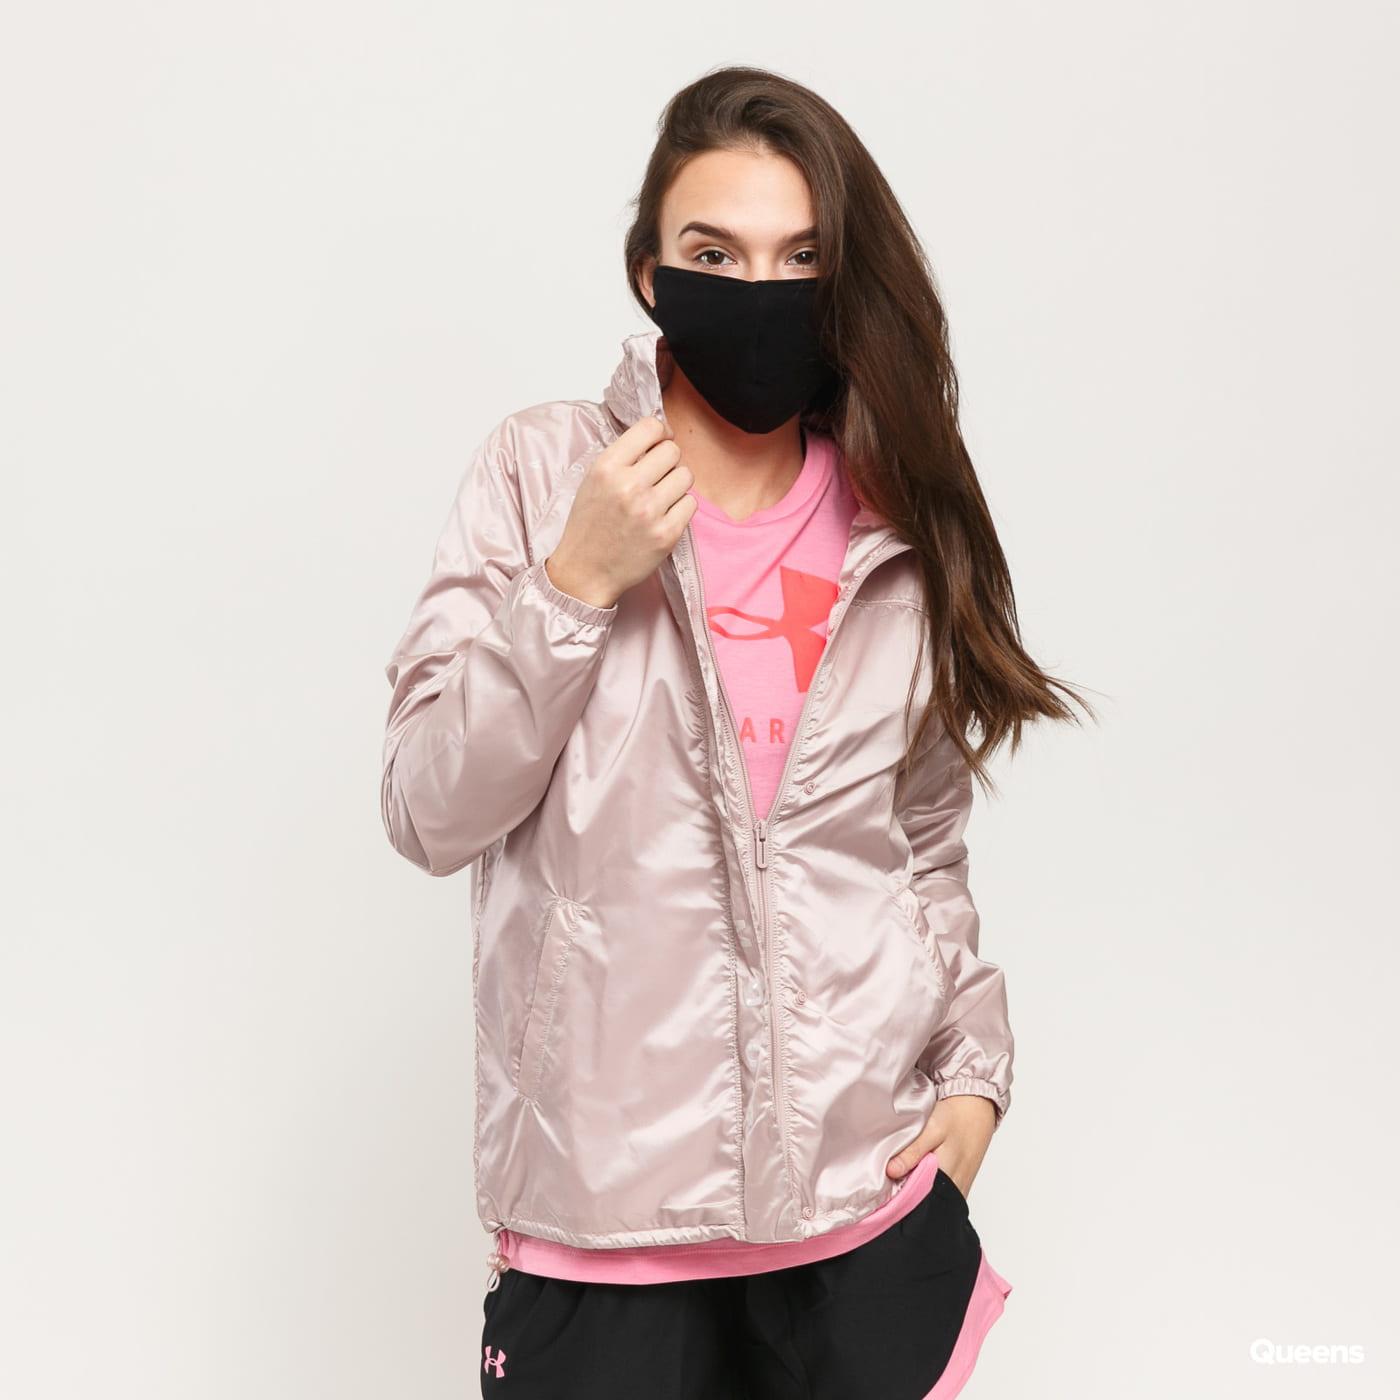 Under Armour Athlete Recovery Woven Iridescent Jacket svetlofialová